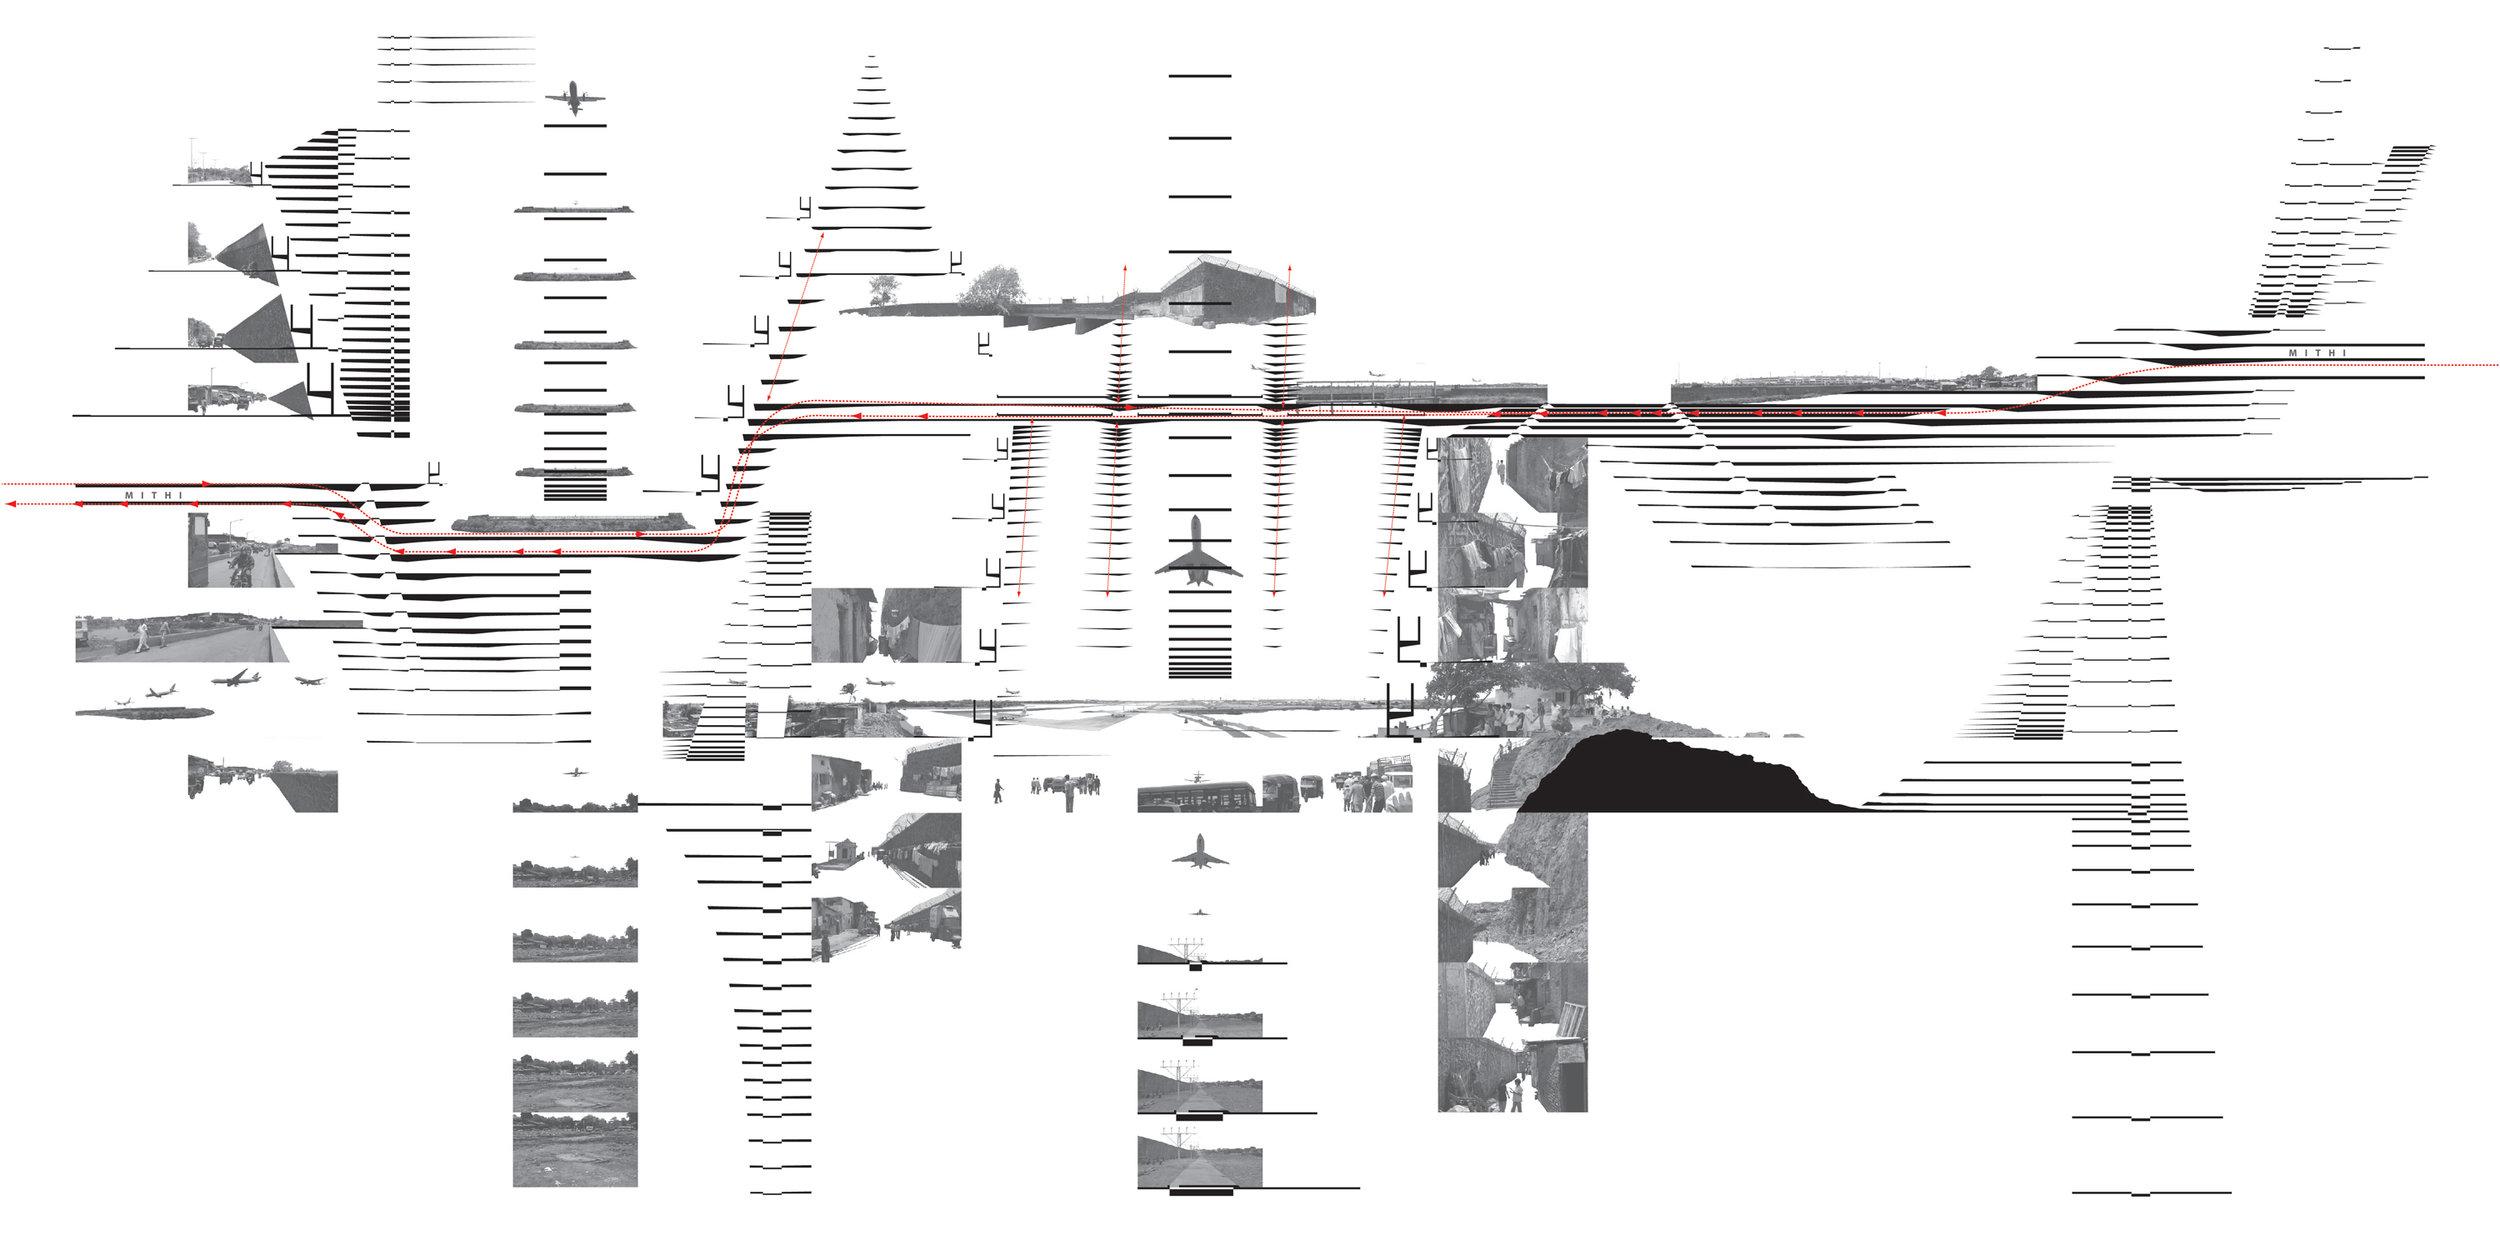 6_airport-crossing_1f.jpg